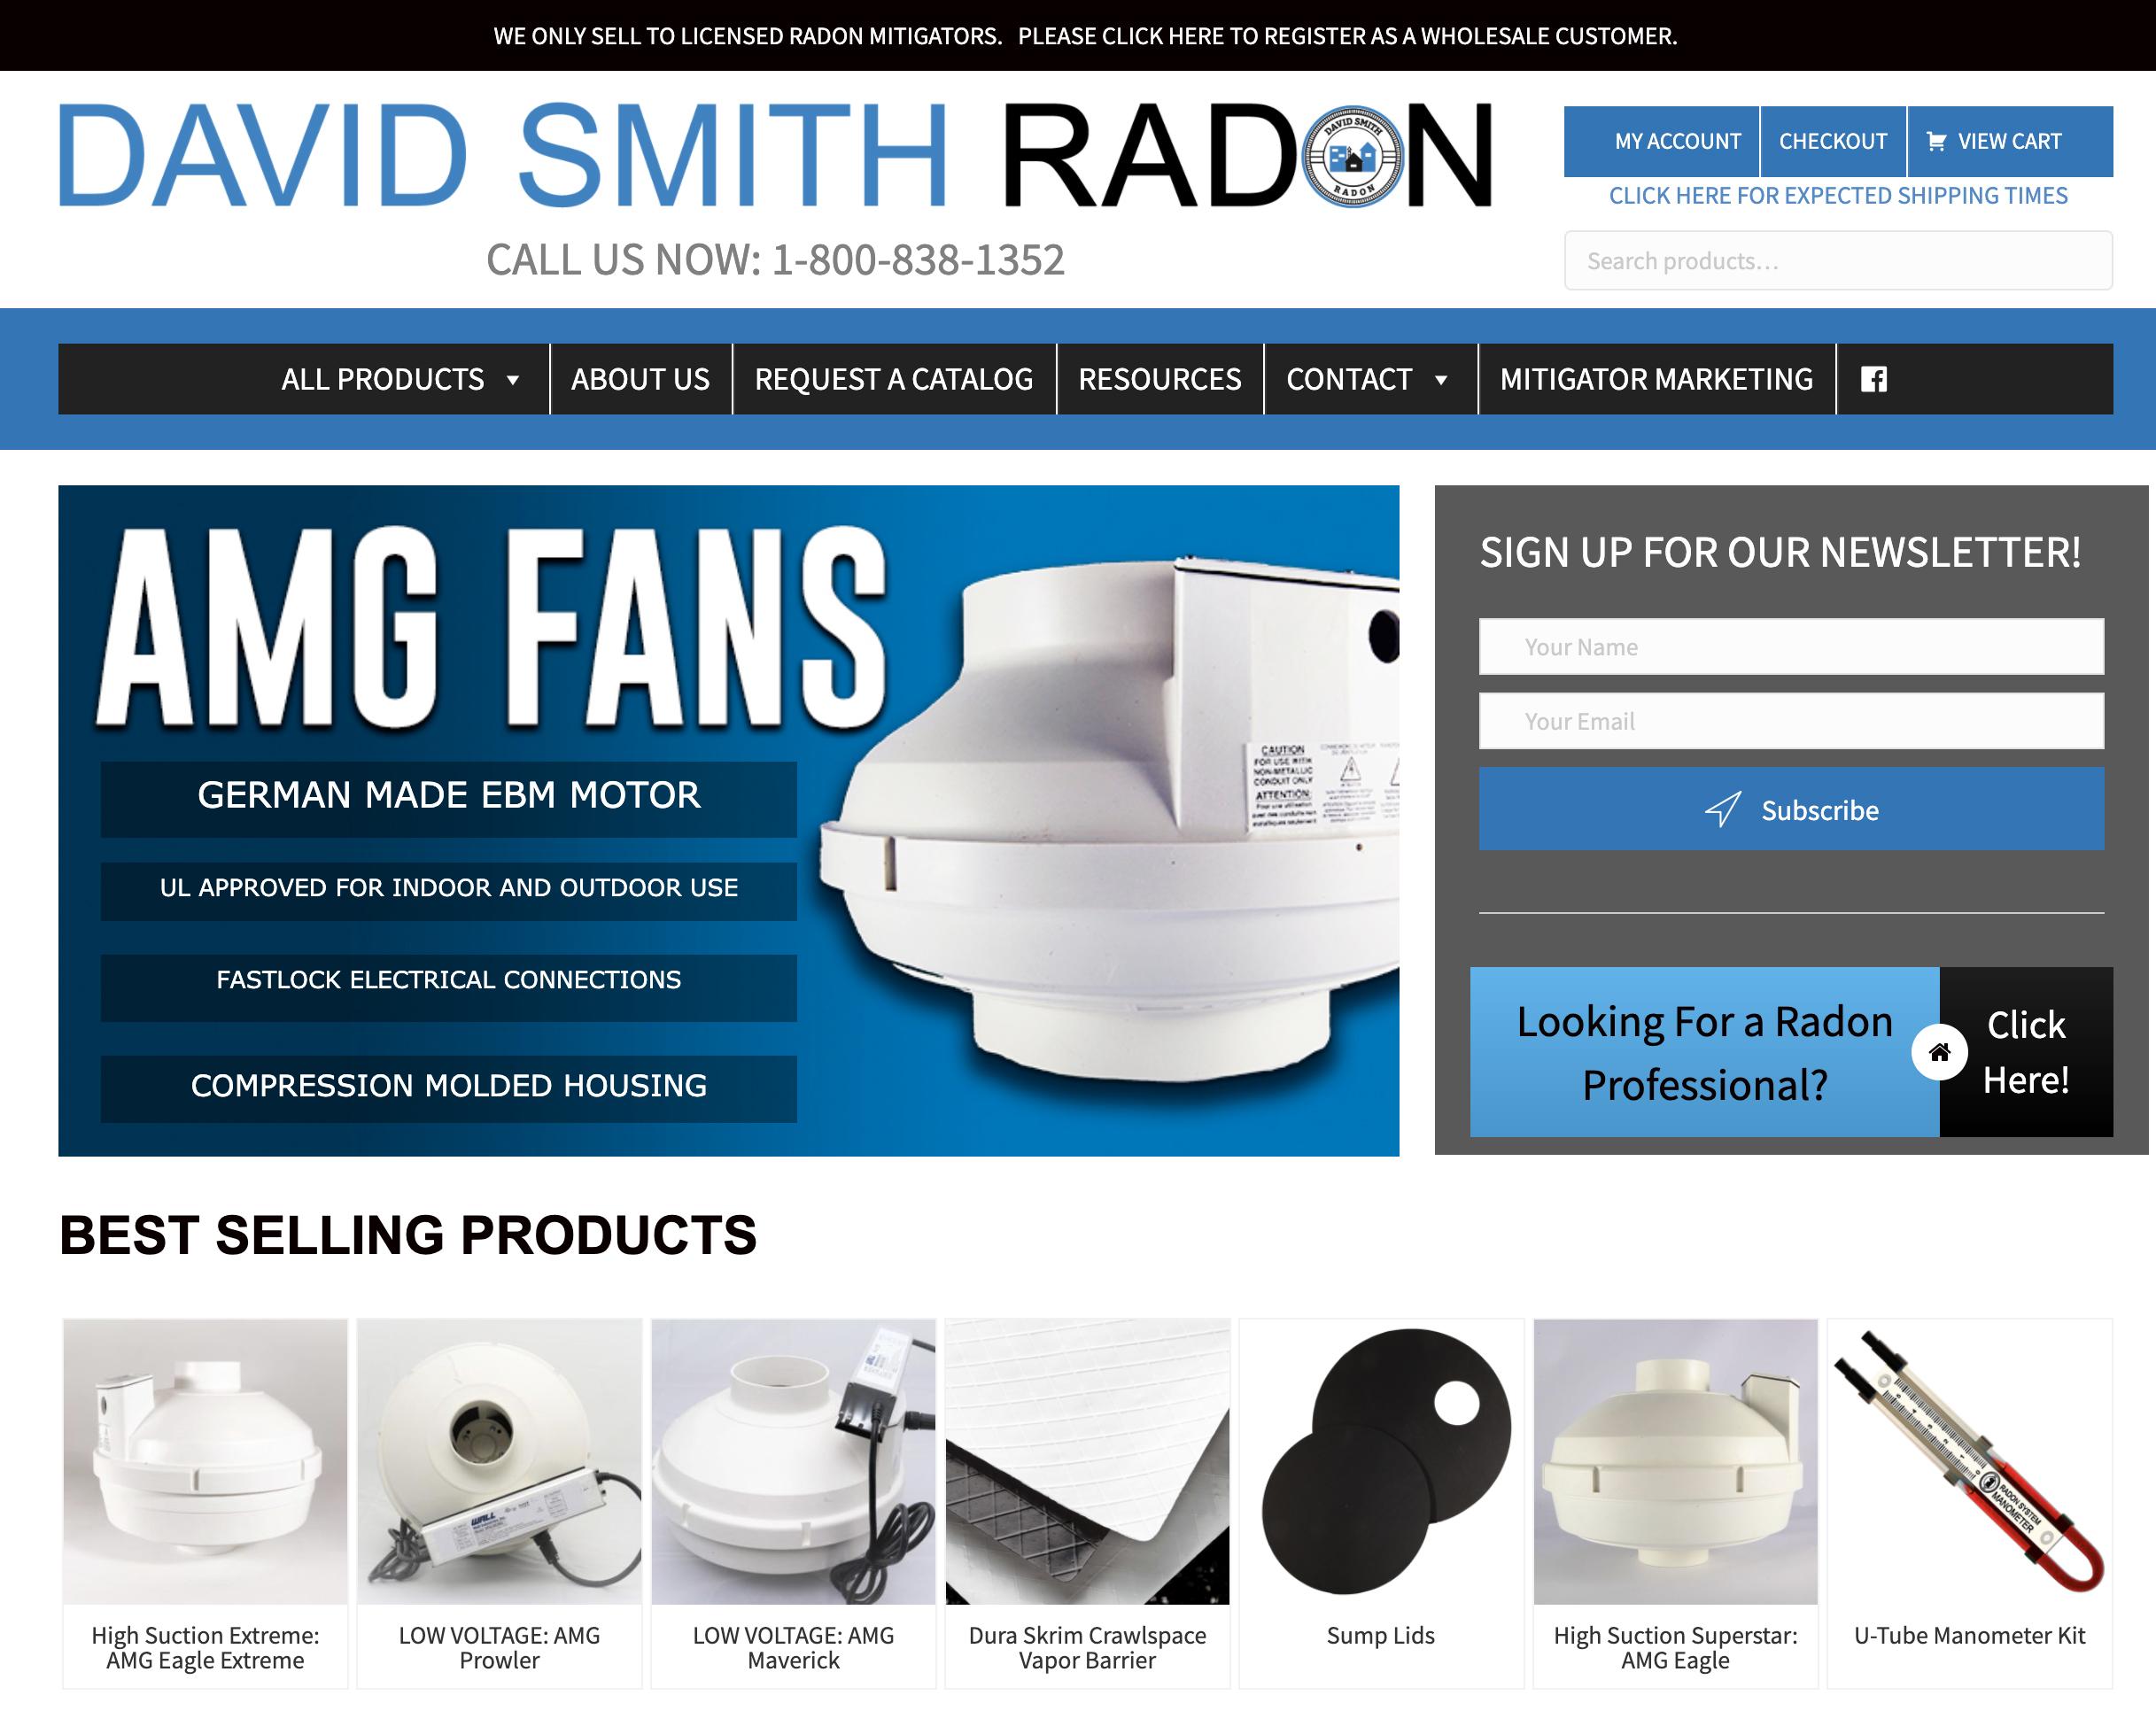 David Smith Radon